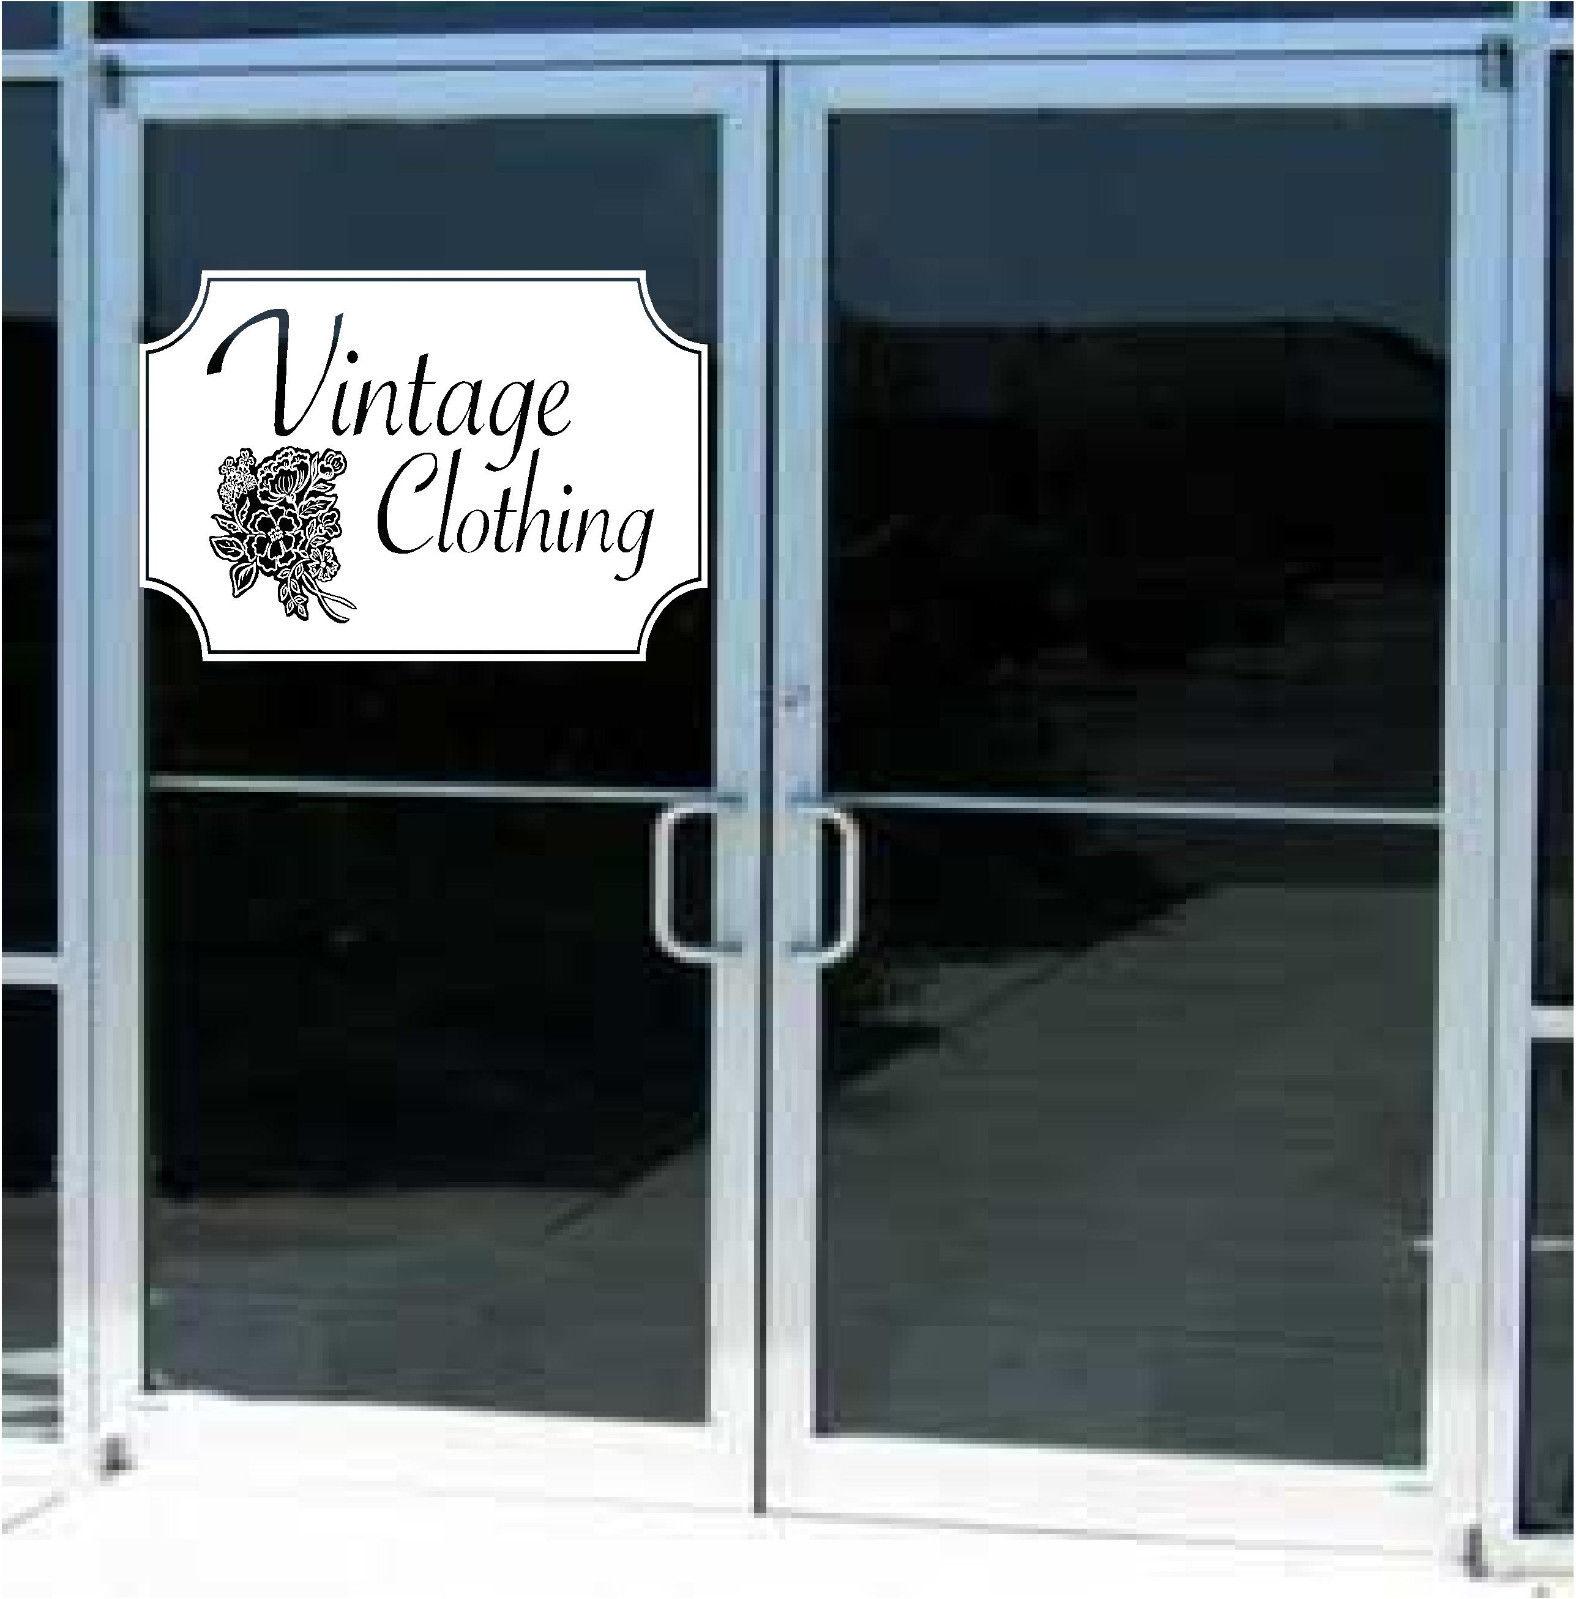 Vintage Clothing Business Sign Vinyl Decal Sticker Sign